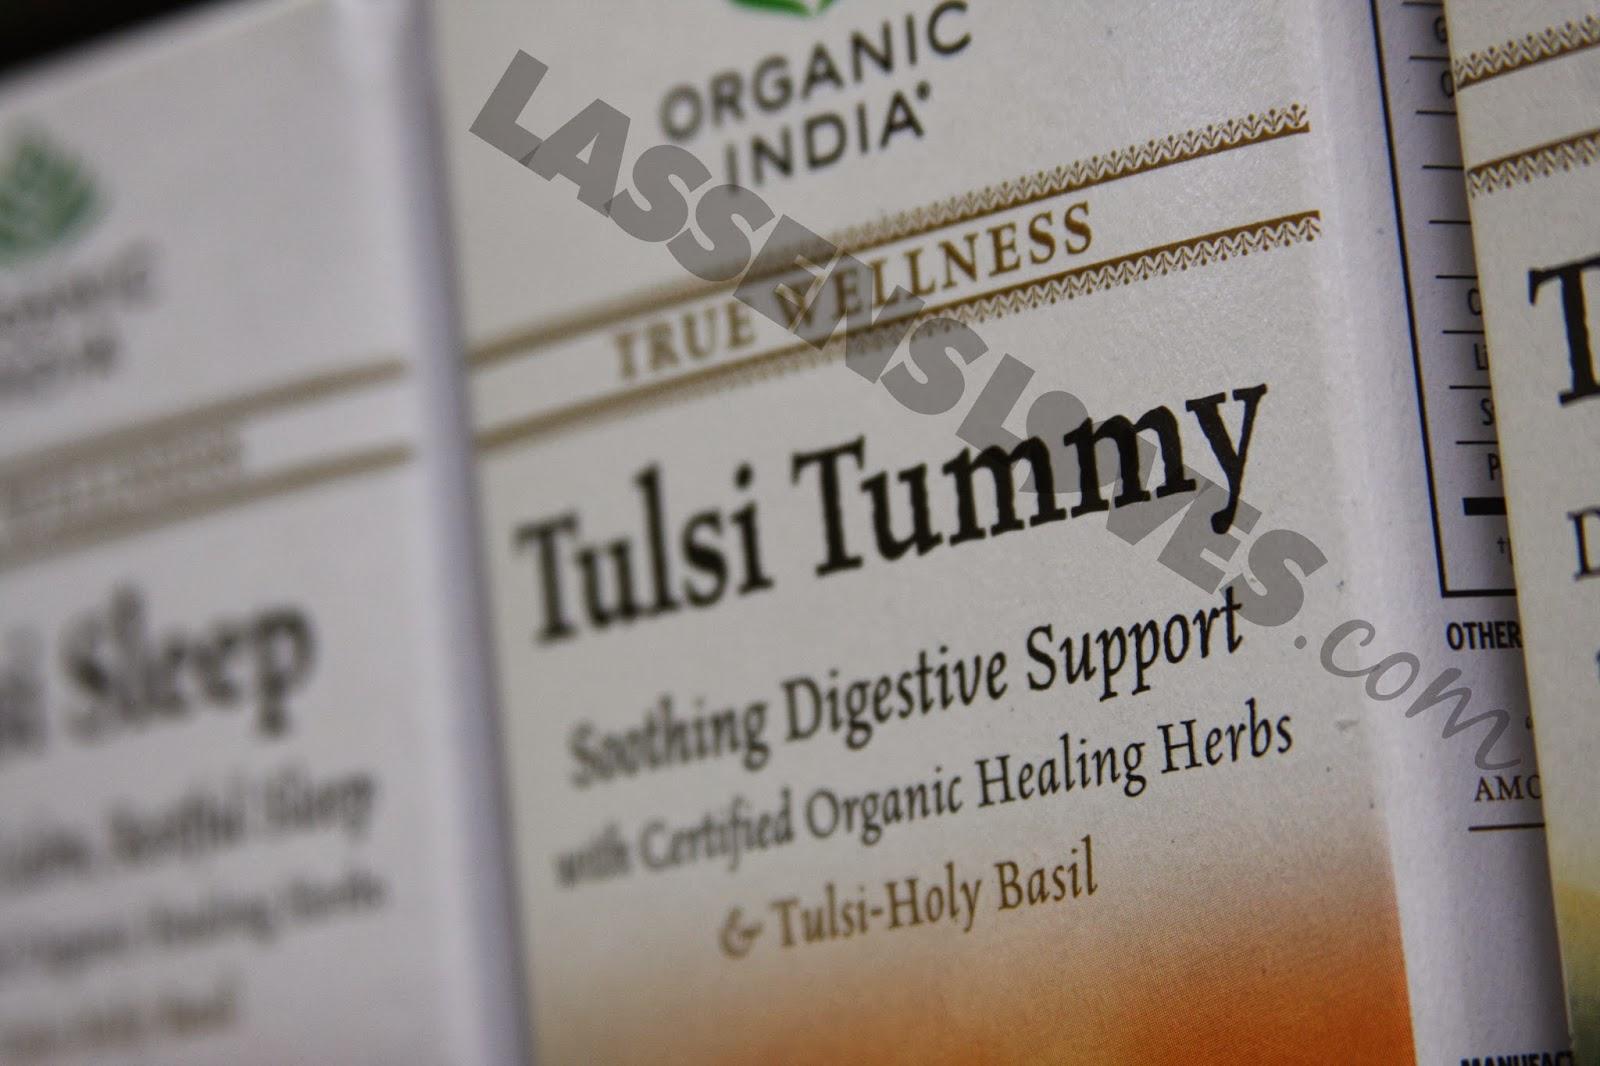 Organic+India, Tulsi+Tummy, Digestive+Aids